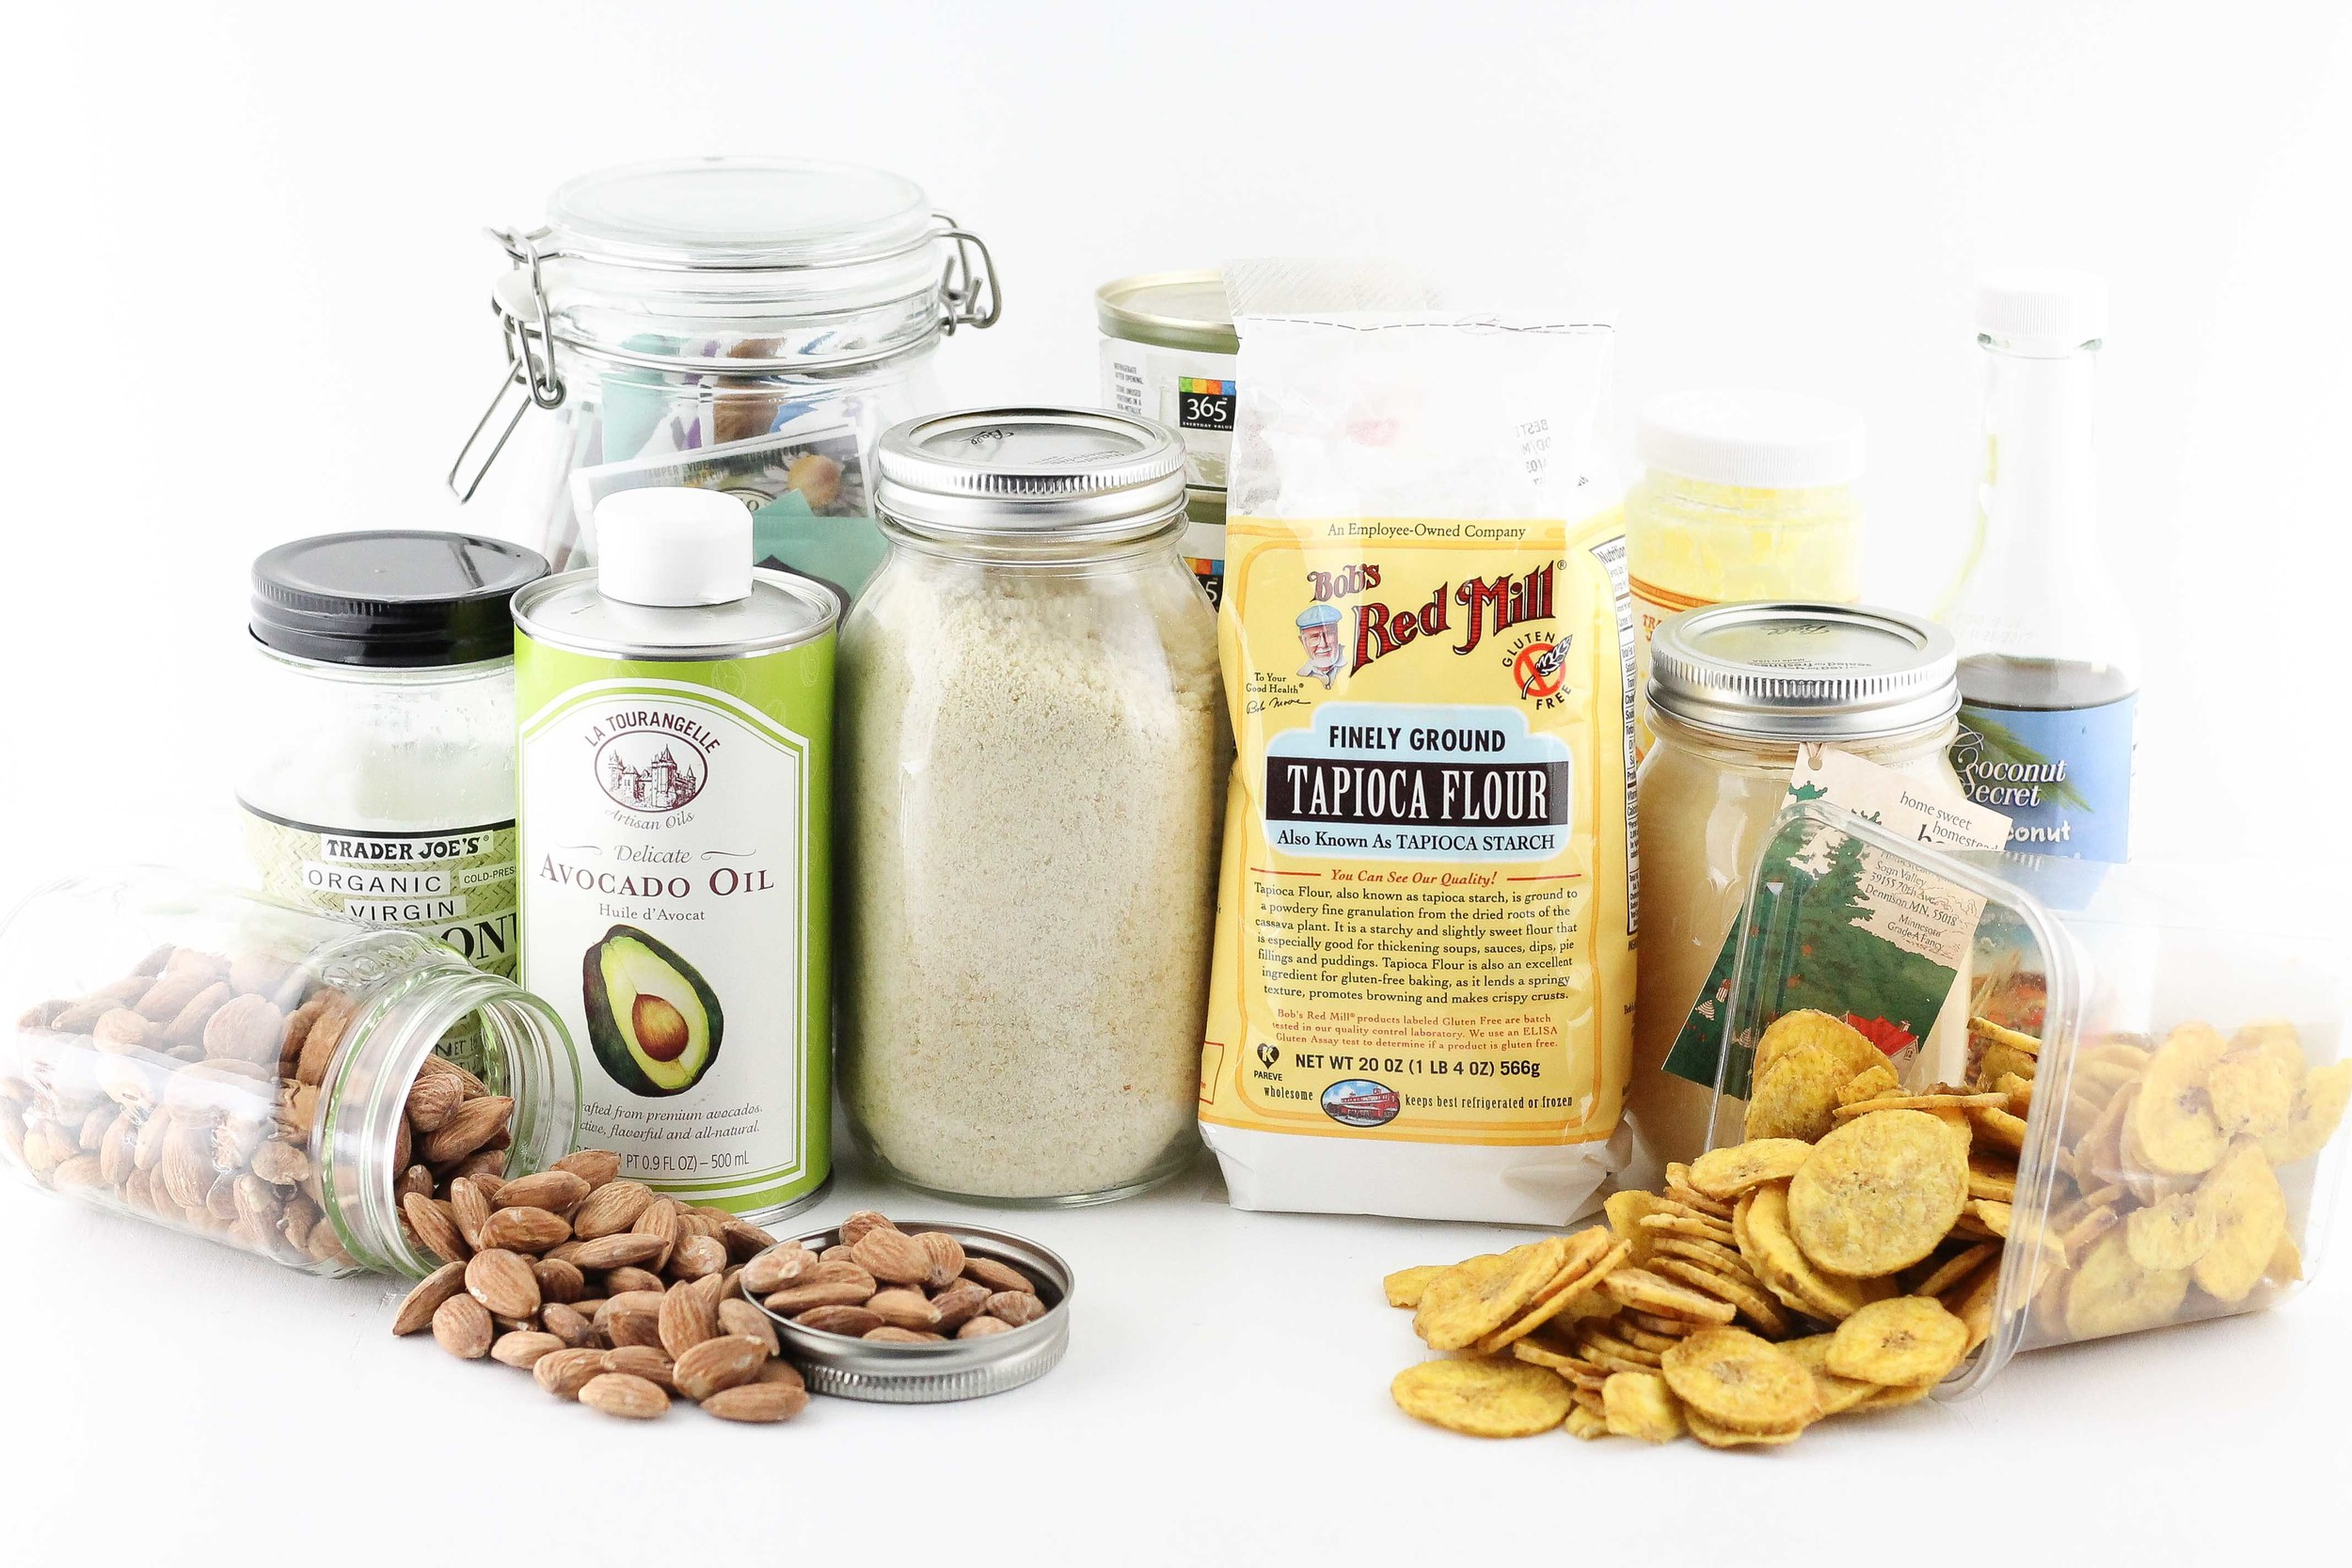 Healthy fats, Grain Free Flour, Grain Free, Gluten Free, Coconut Oil, Wild Caught Fish, Plantain Chips, Ghee